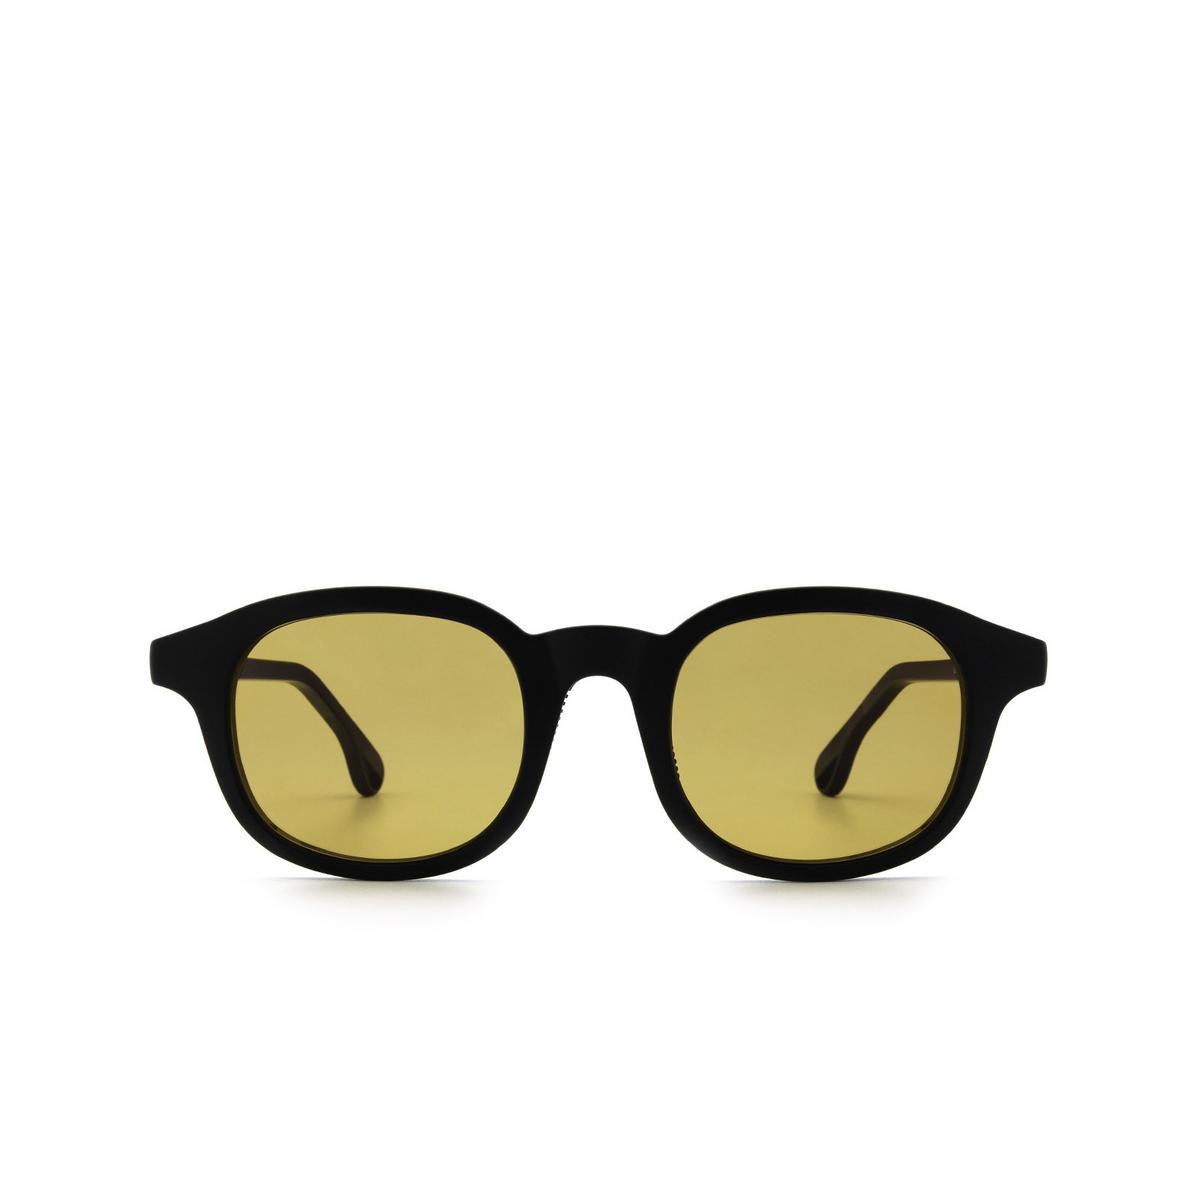 Chimi® Square Sunglasses: 01 ACTIVE color Black - front view.